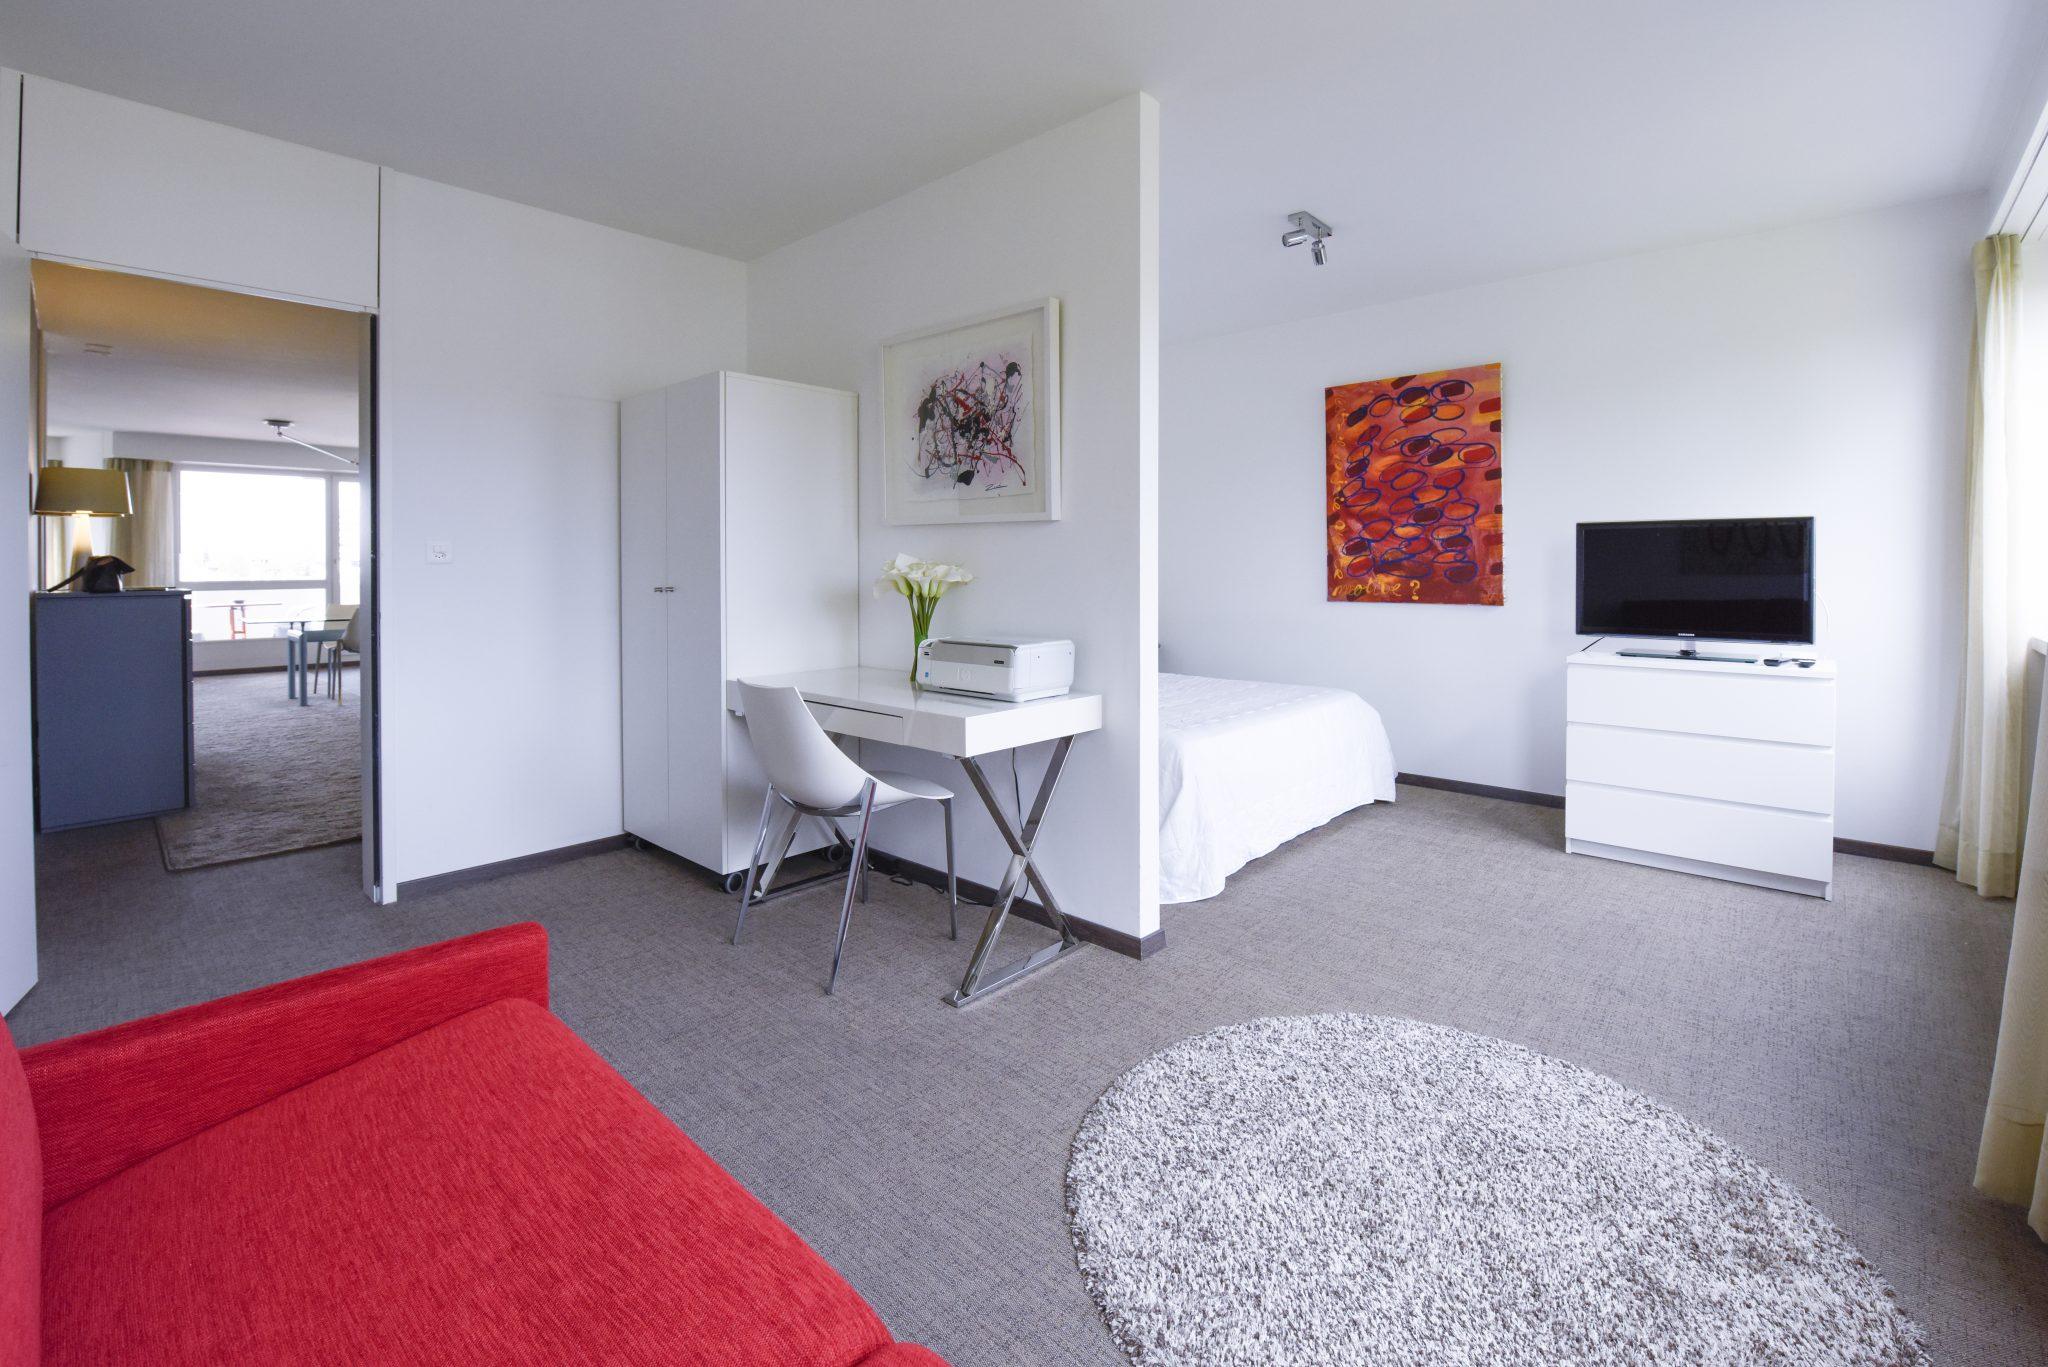 shooting-appartement-mobilier-lausanne-photographe-photo-architecture